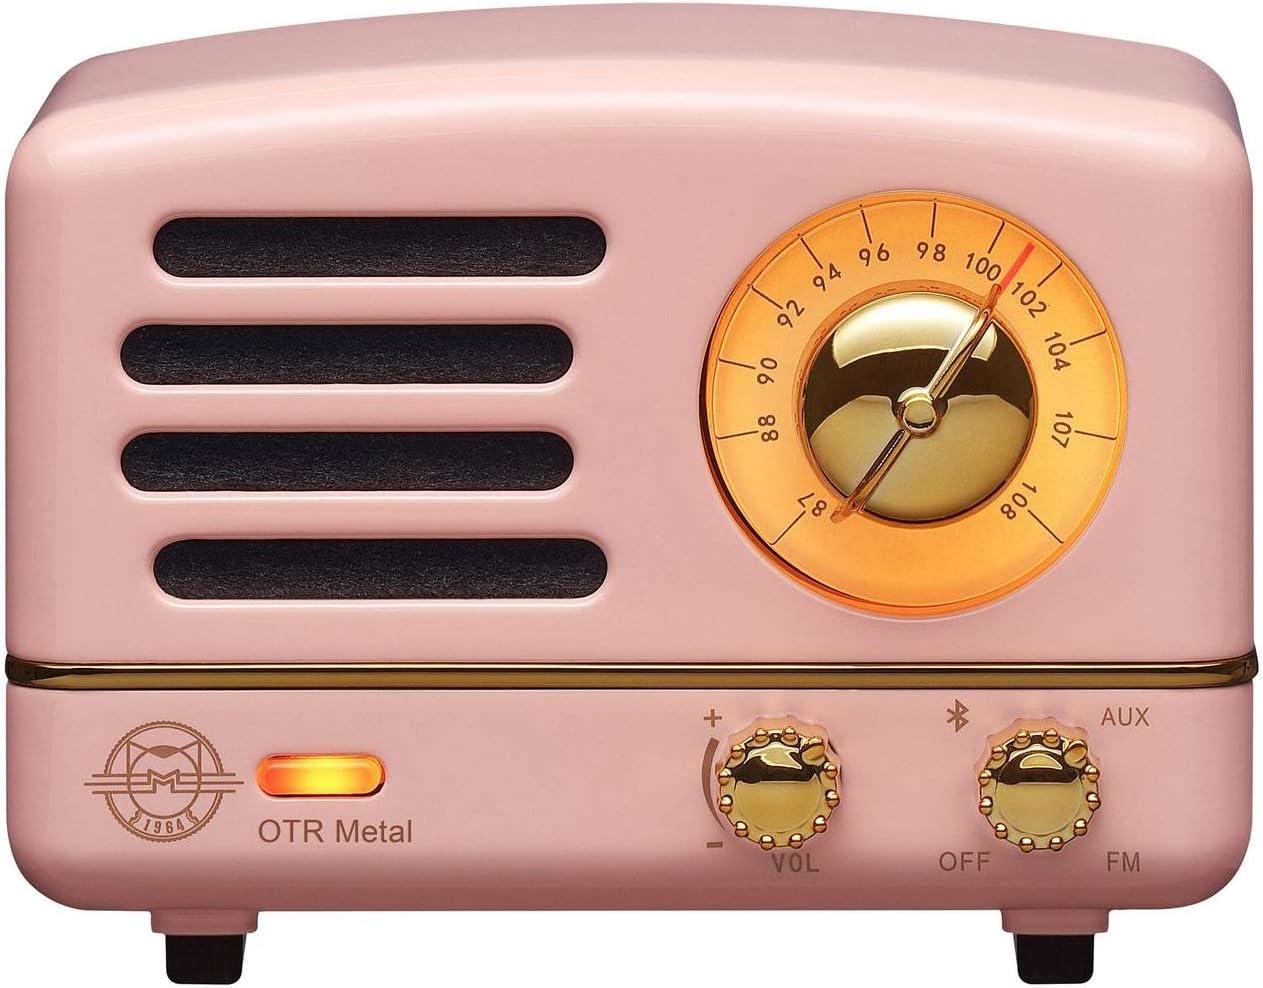 Muzen Portable Wireless High Definition Audio FM Radio Bluetooth Speaker, Metal Pink, Travel Case Included – Classic Vintage Retro Design